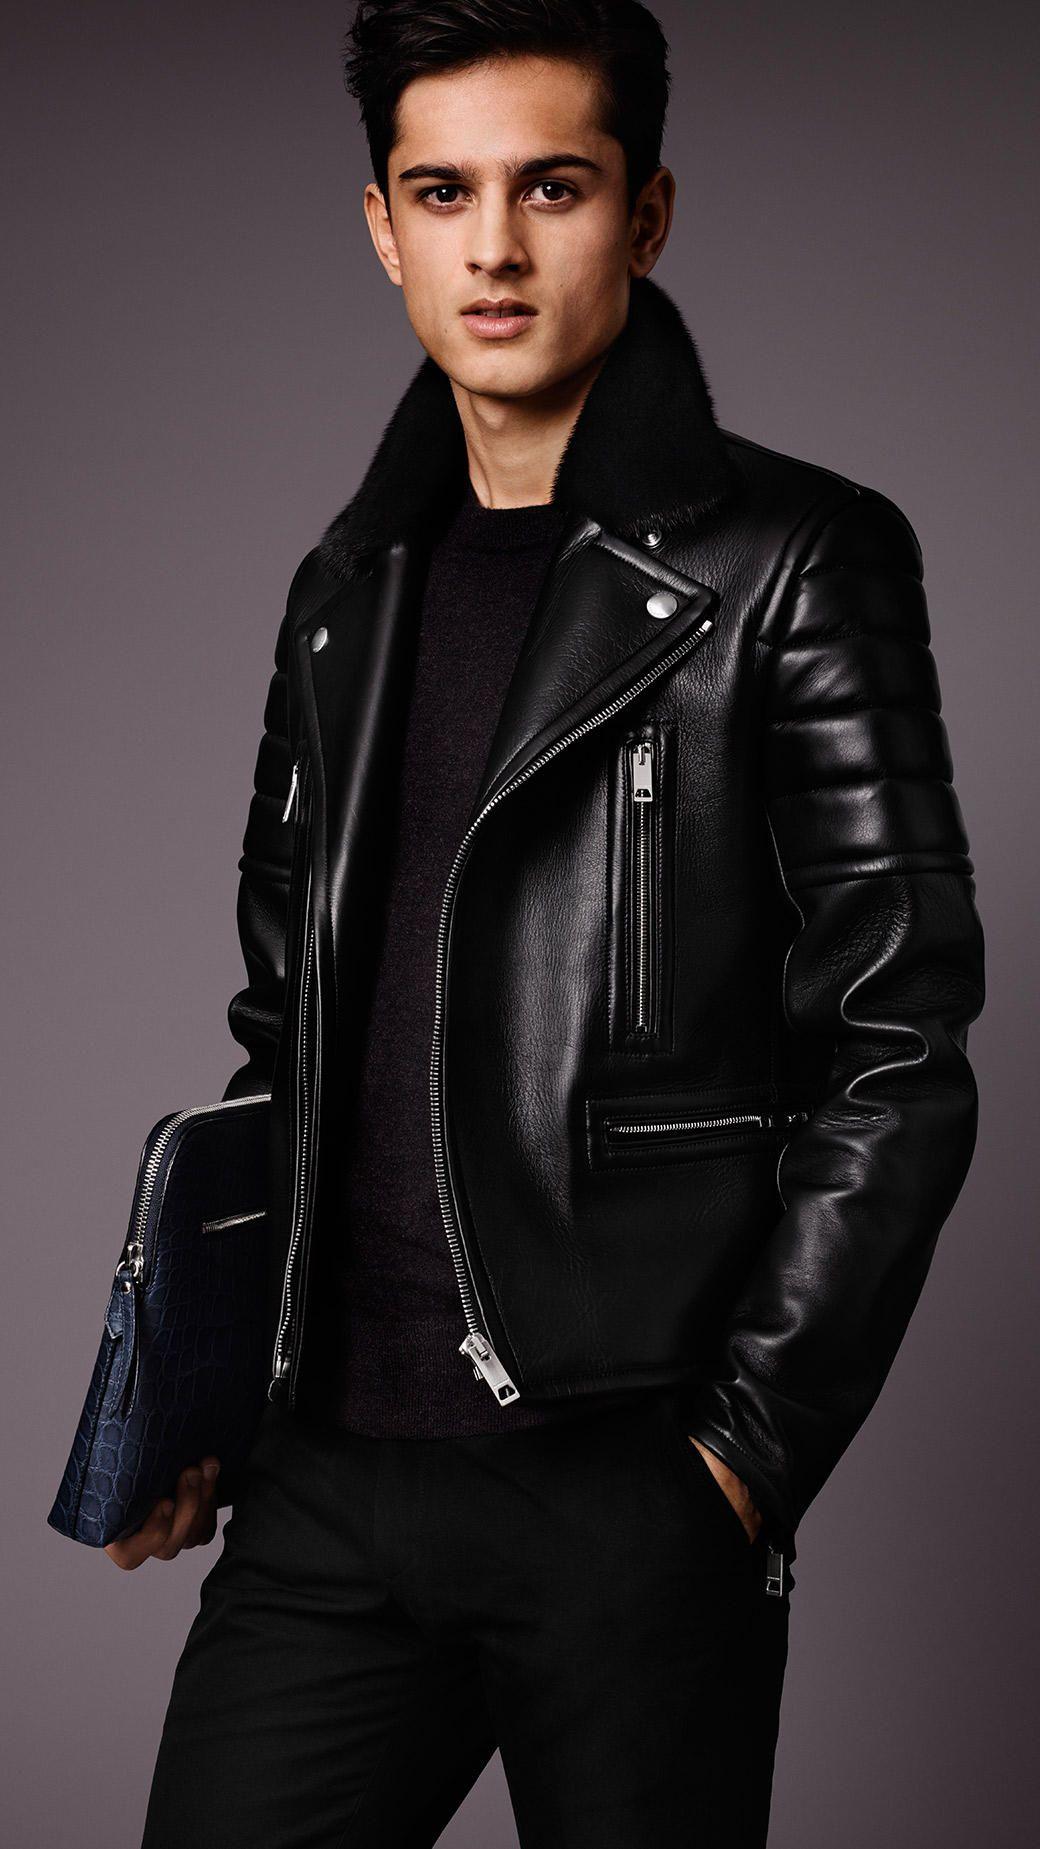 Nappa Leather Biker Jacket With Mink Topcollar Burberry Leather Jacket Leather Jacket Men Jackets Men Fashion [ 1849 x 1040 Pixel ]